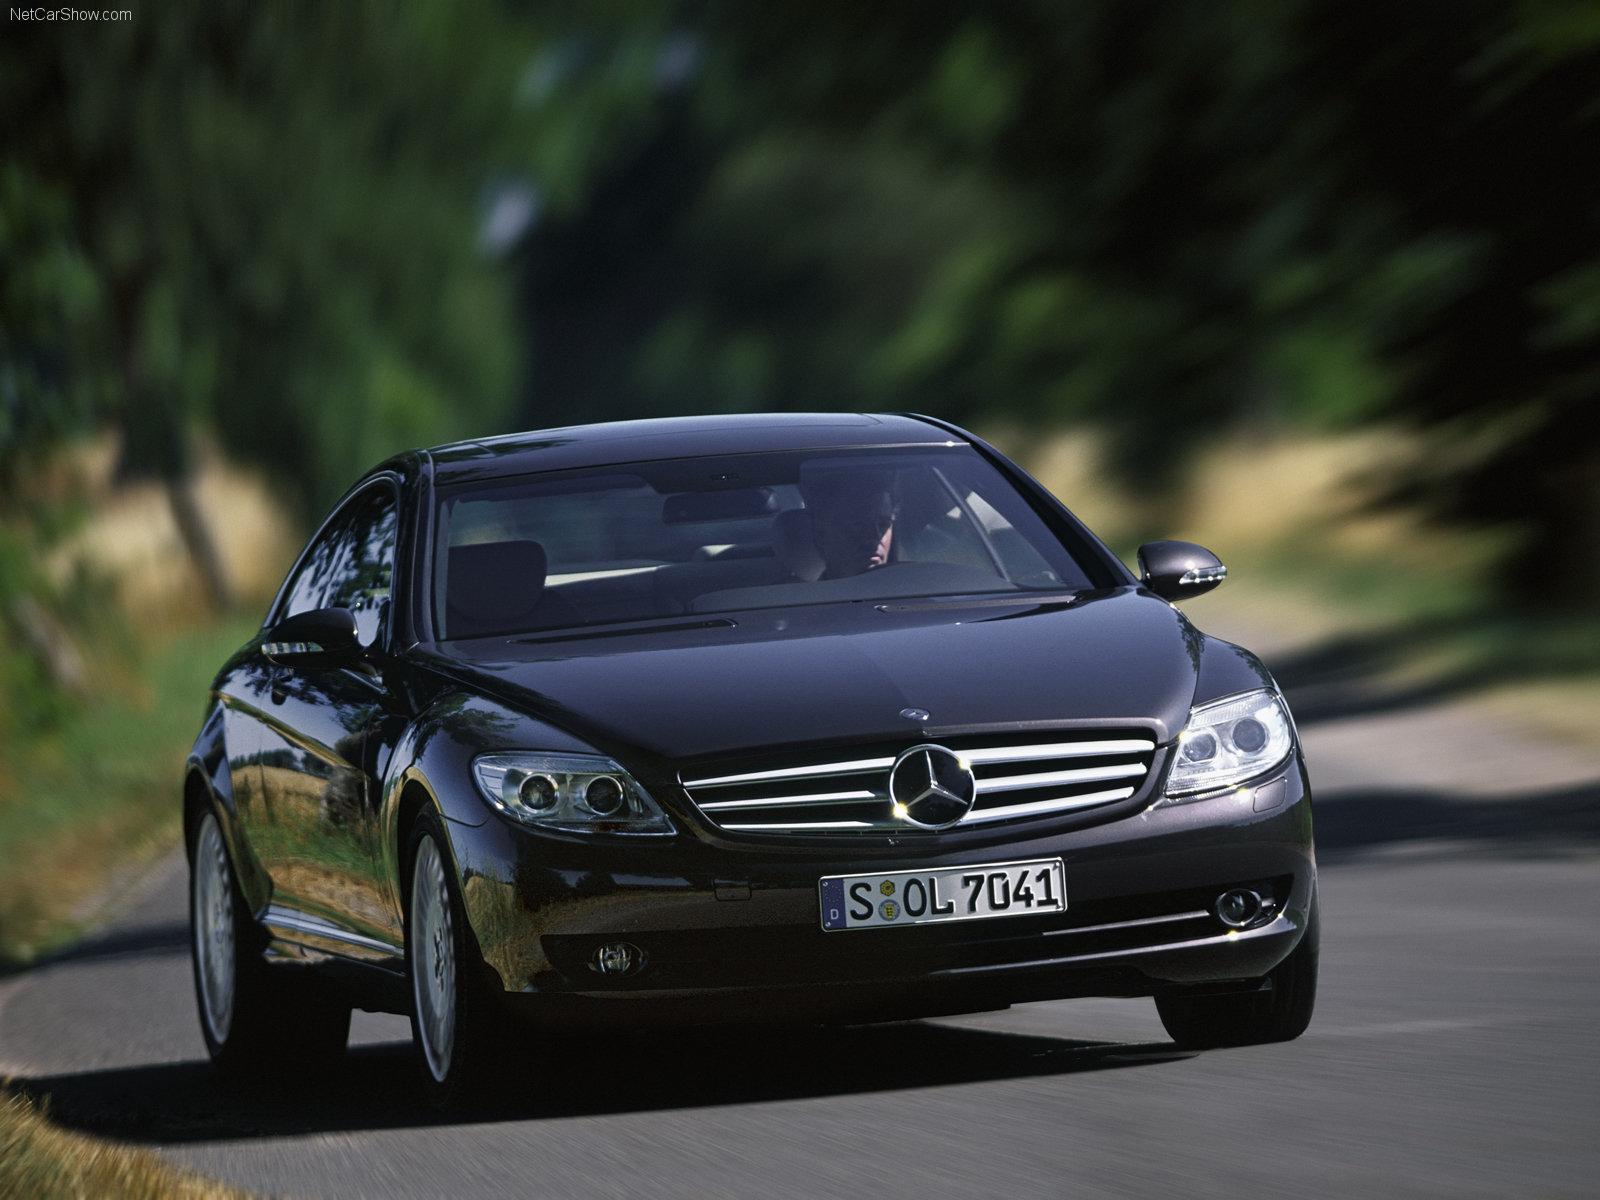 Mercedes-Benz CL-Class W216 Picture # 38118